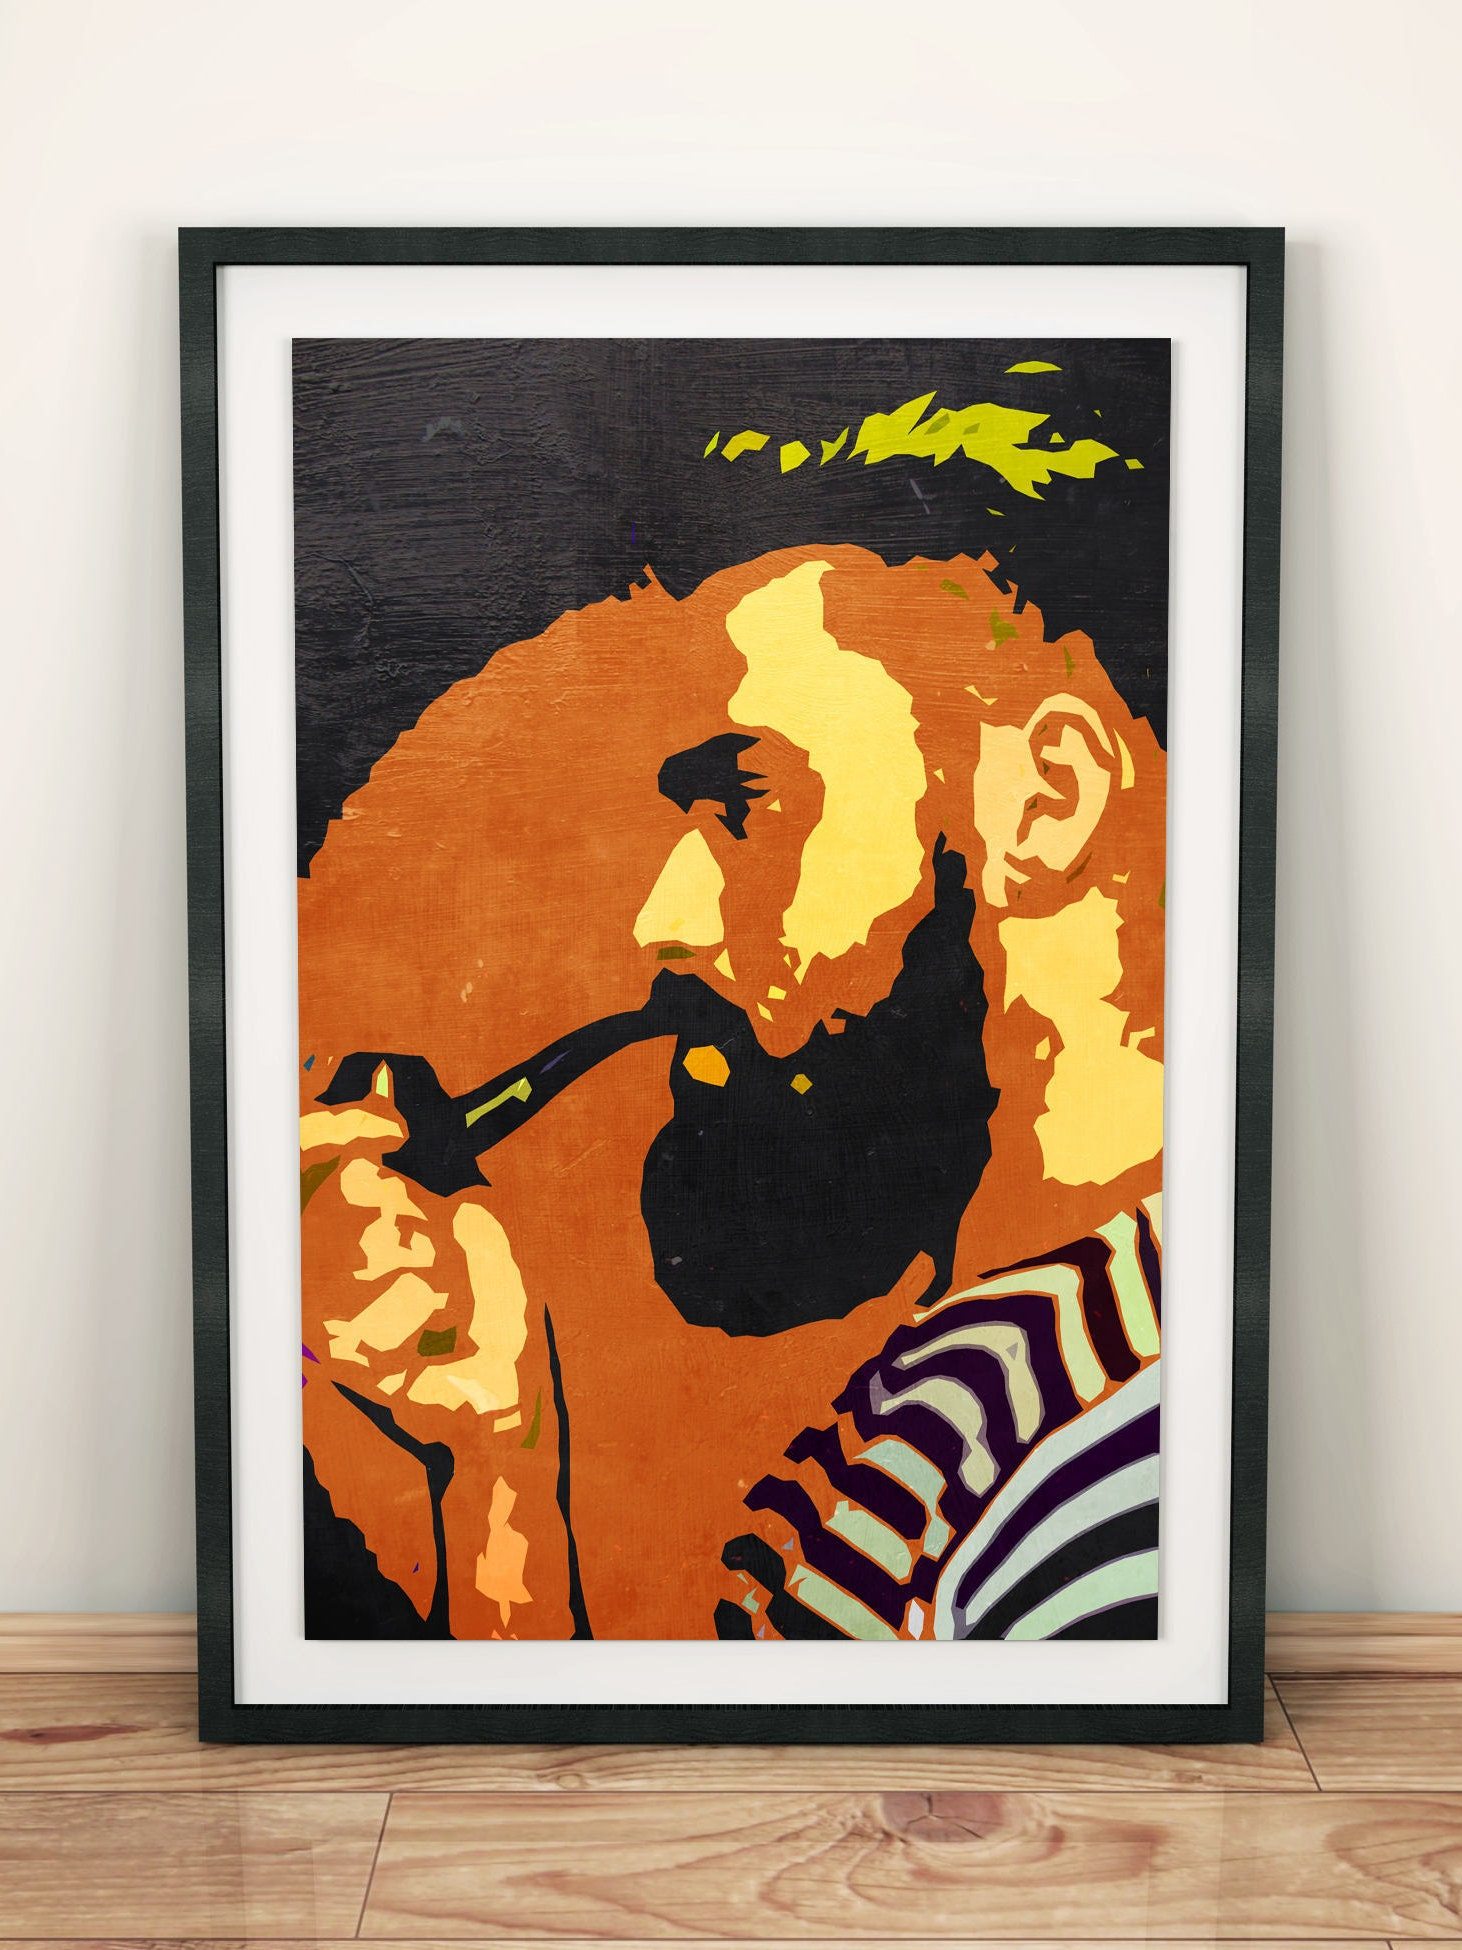 SMOKE SMOKING MAN TRIPPY ABSTRACT COOL MODERN WALL ART PRINT LARGE